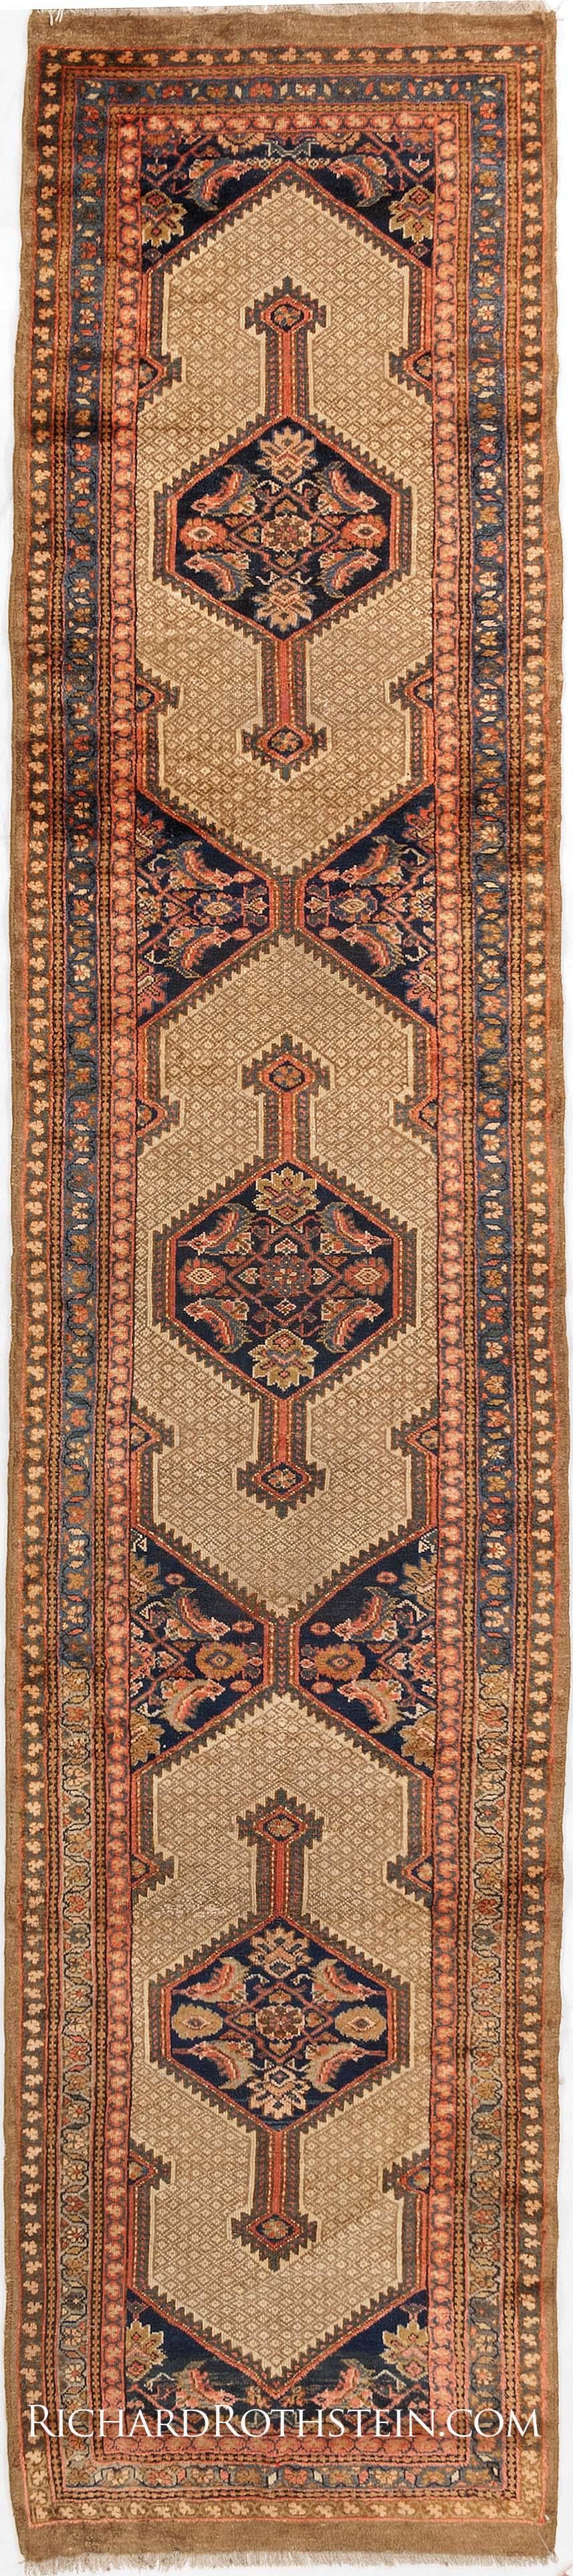 Antique serab runner oriental carpet antrr887